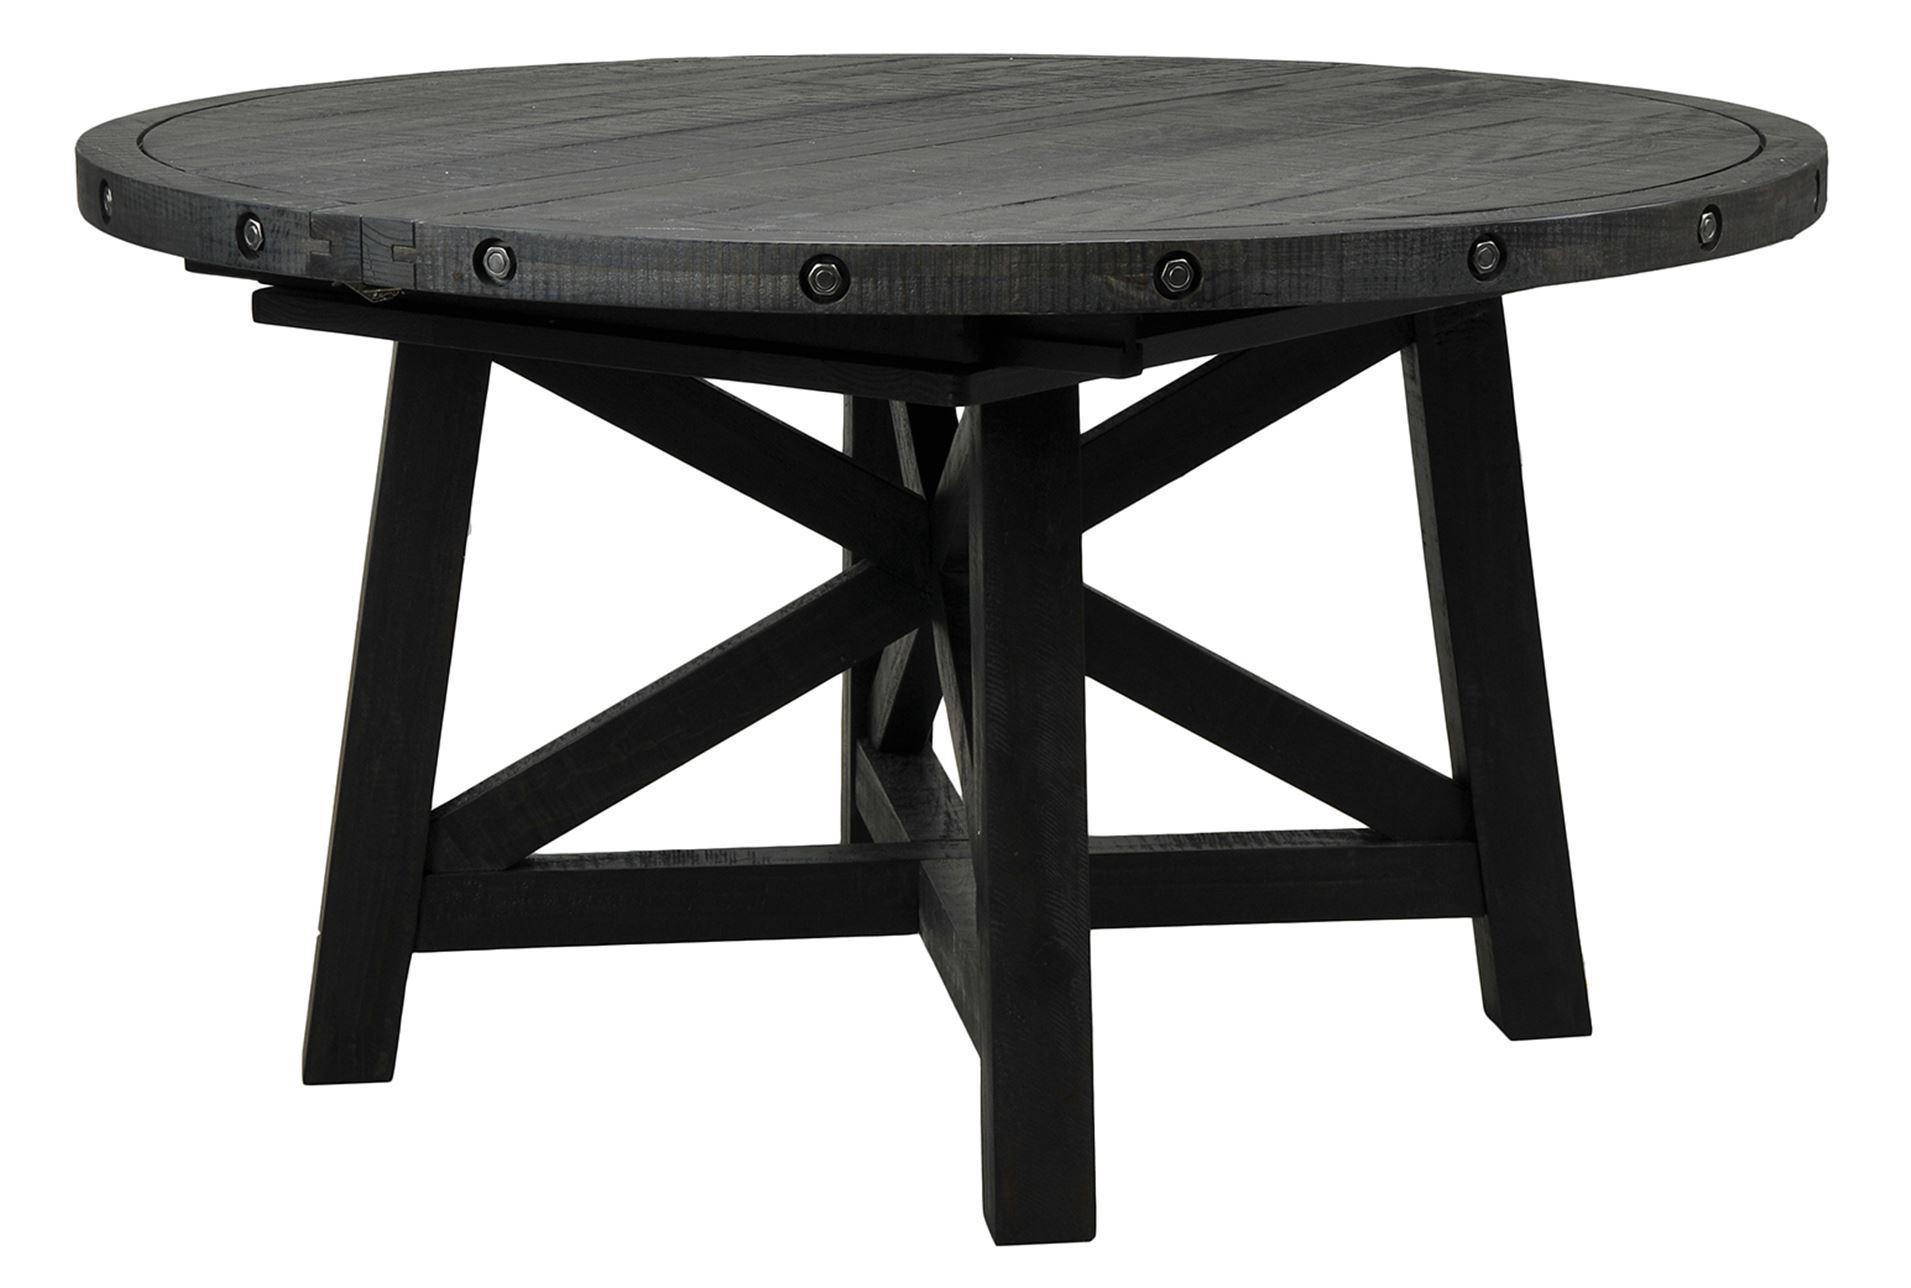 Jaxon Round Dining Table